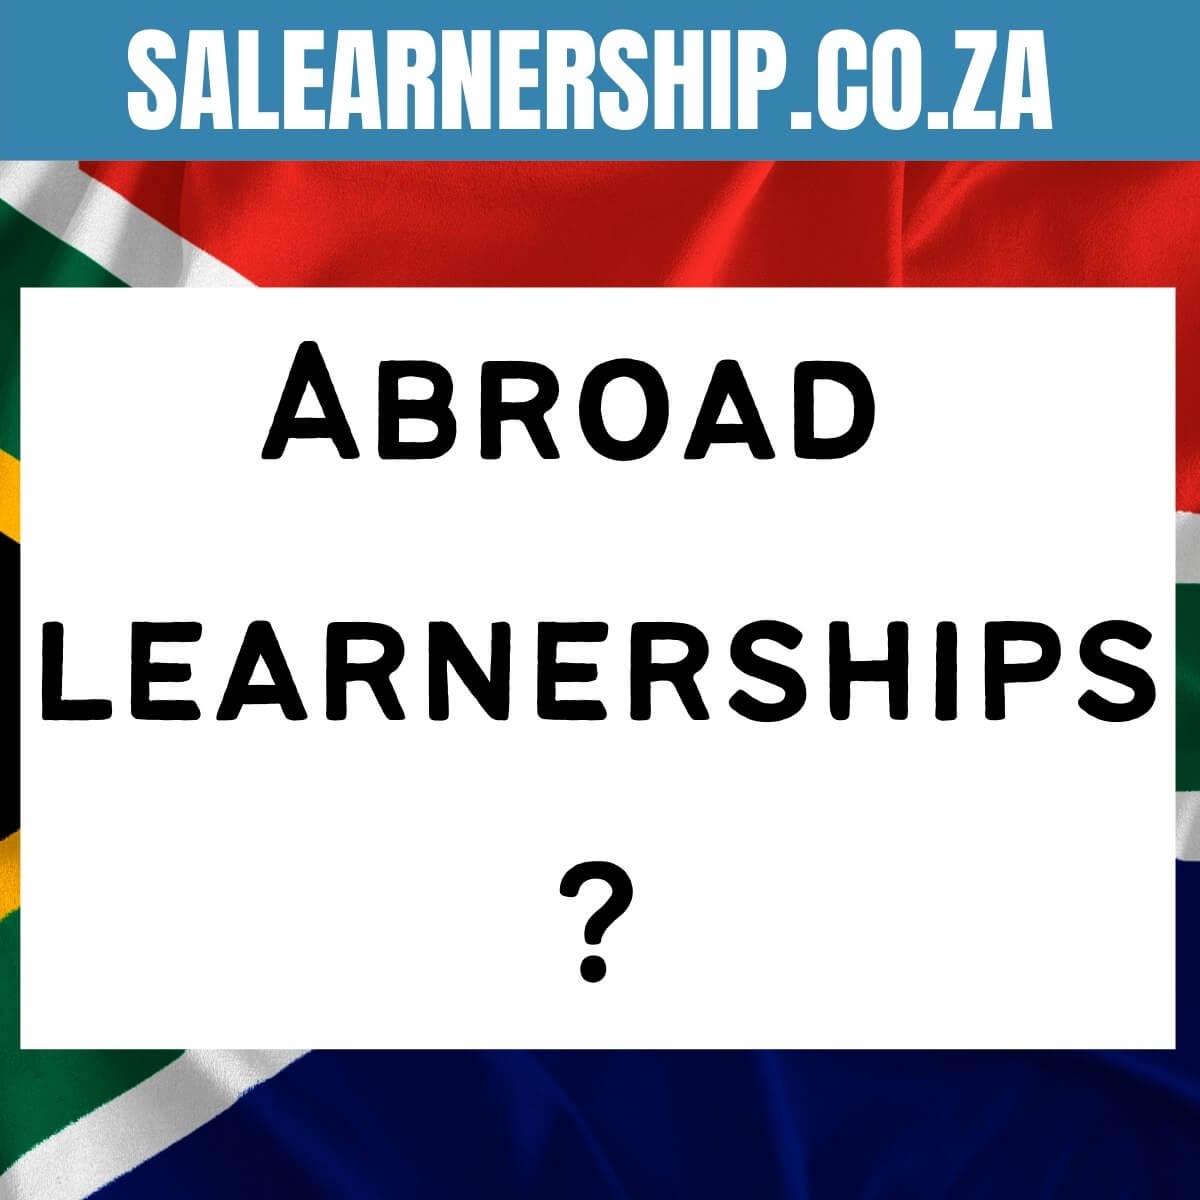 abroad learnerships